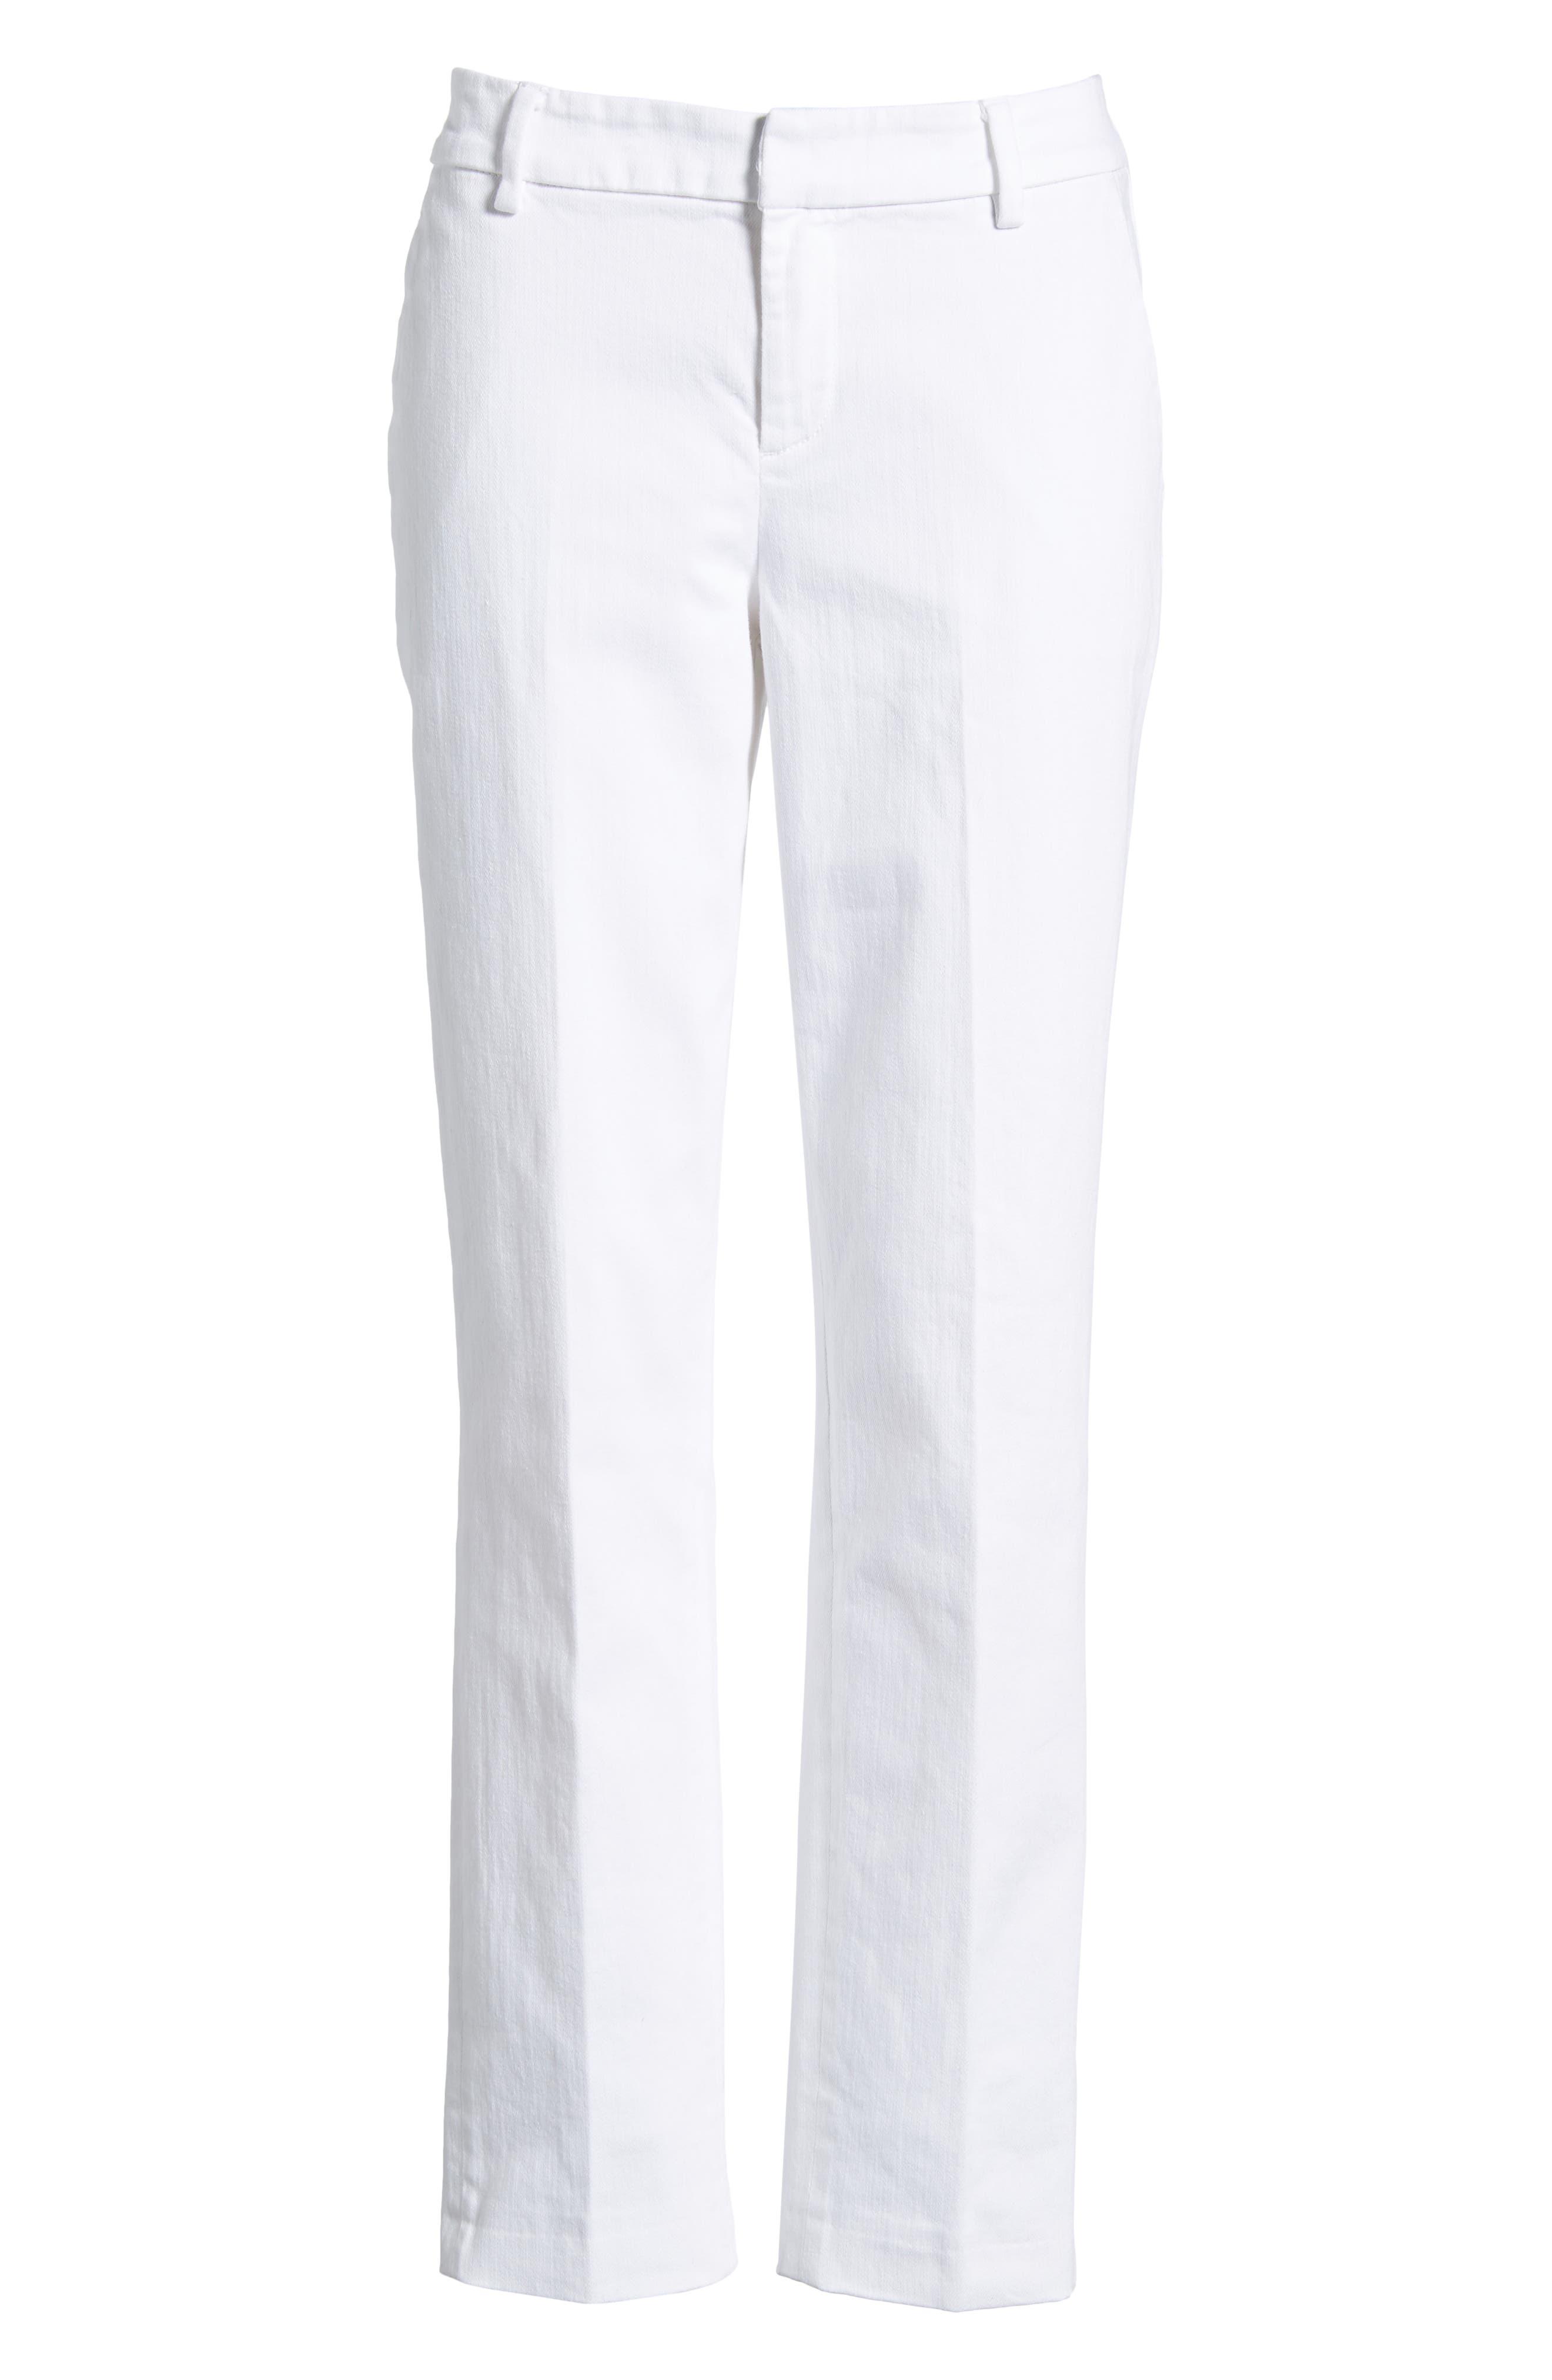 Kelsey Trousers,                             Alternate thumbnail 6, color,                             BRIGHT WHITE